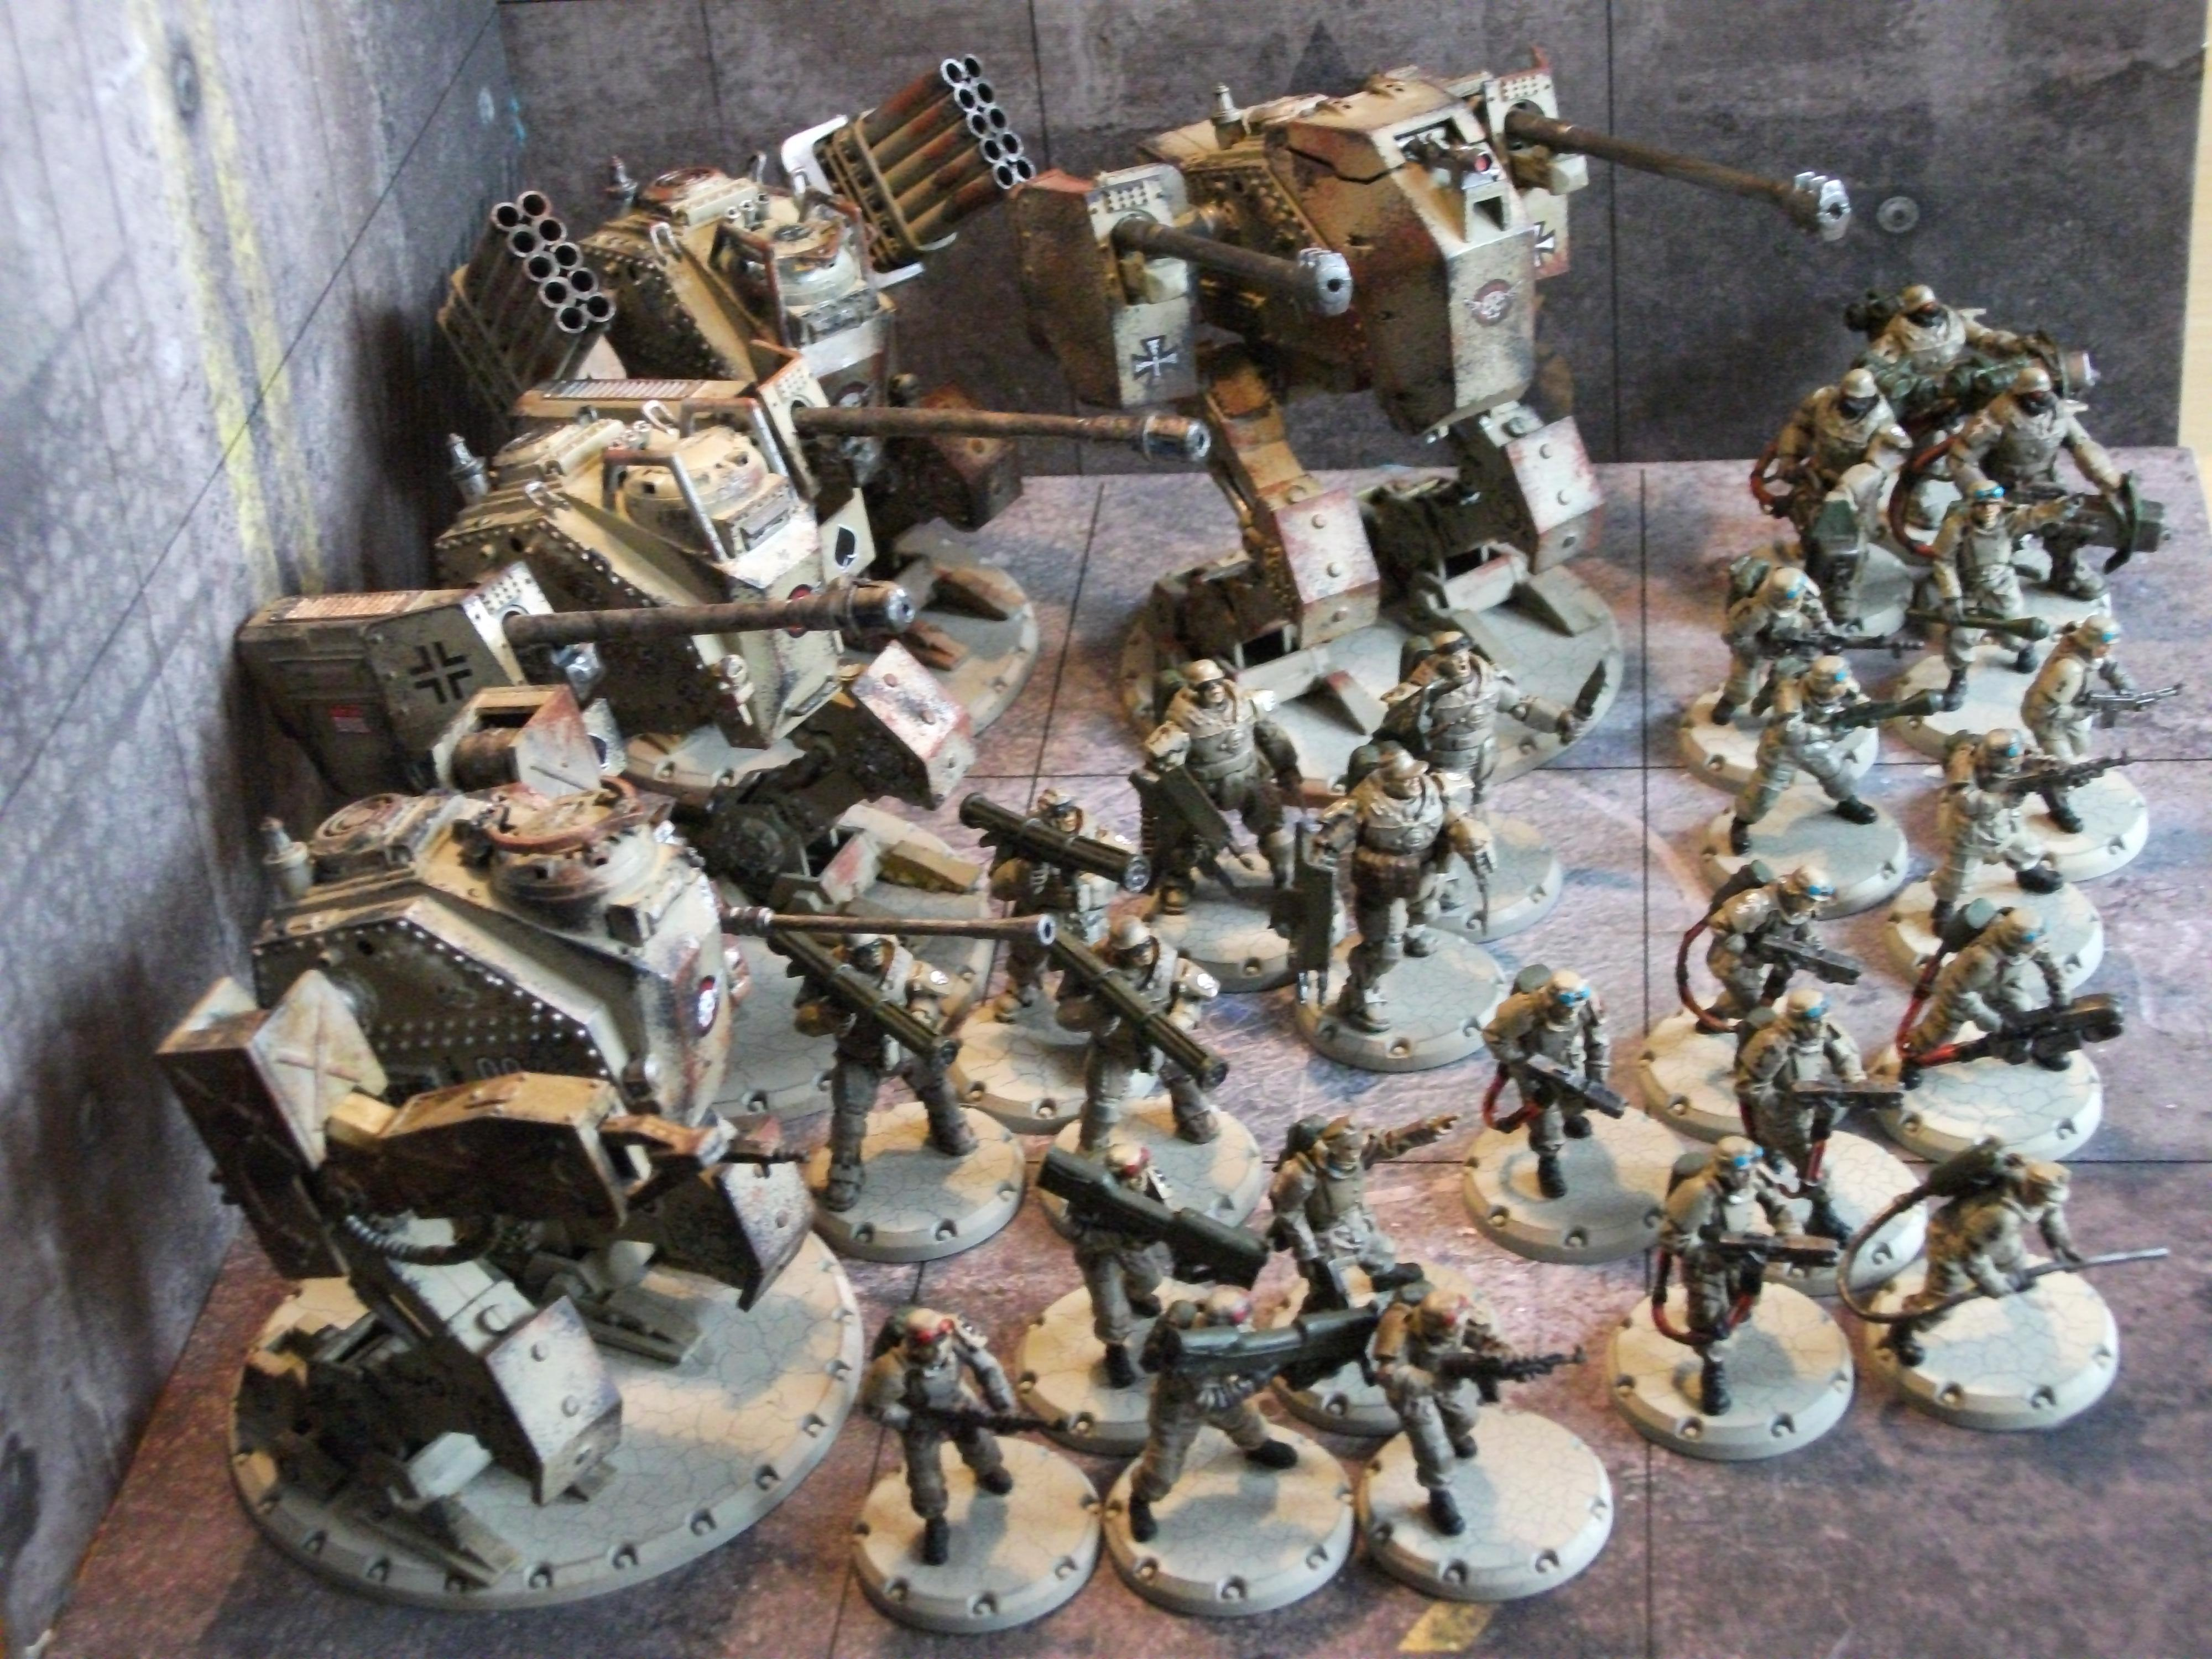 Axis, Bergeluther, Combat Platoon, Dust, Dust Tactics, Dust Warfare, Flakmeister, Infantry, Jagdwotan, Mech, Nordwind, Paolo Parente, Tiger, Tiger Tank, Tiger Vk, Walker, World War 2, Zero